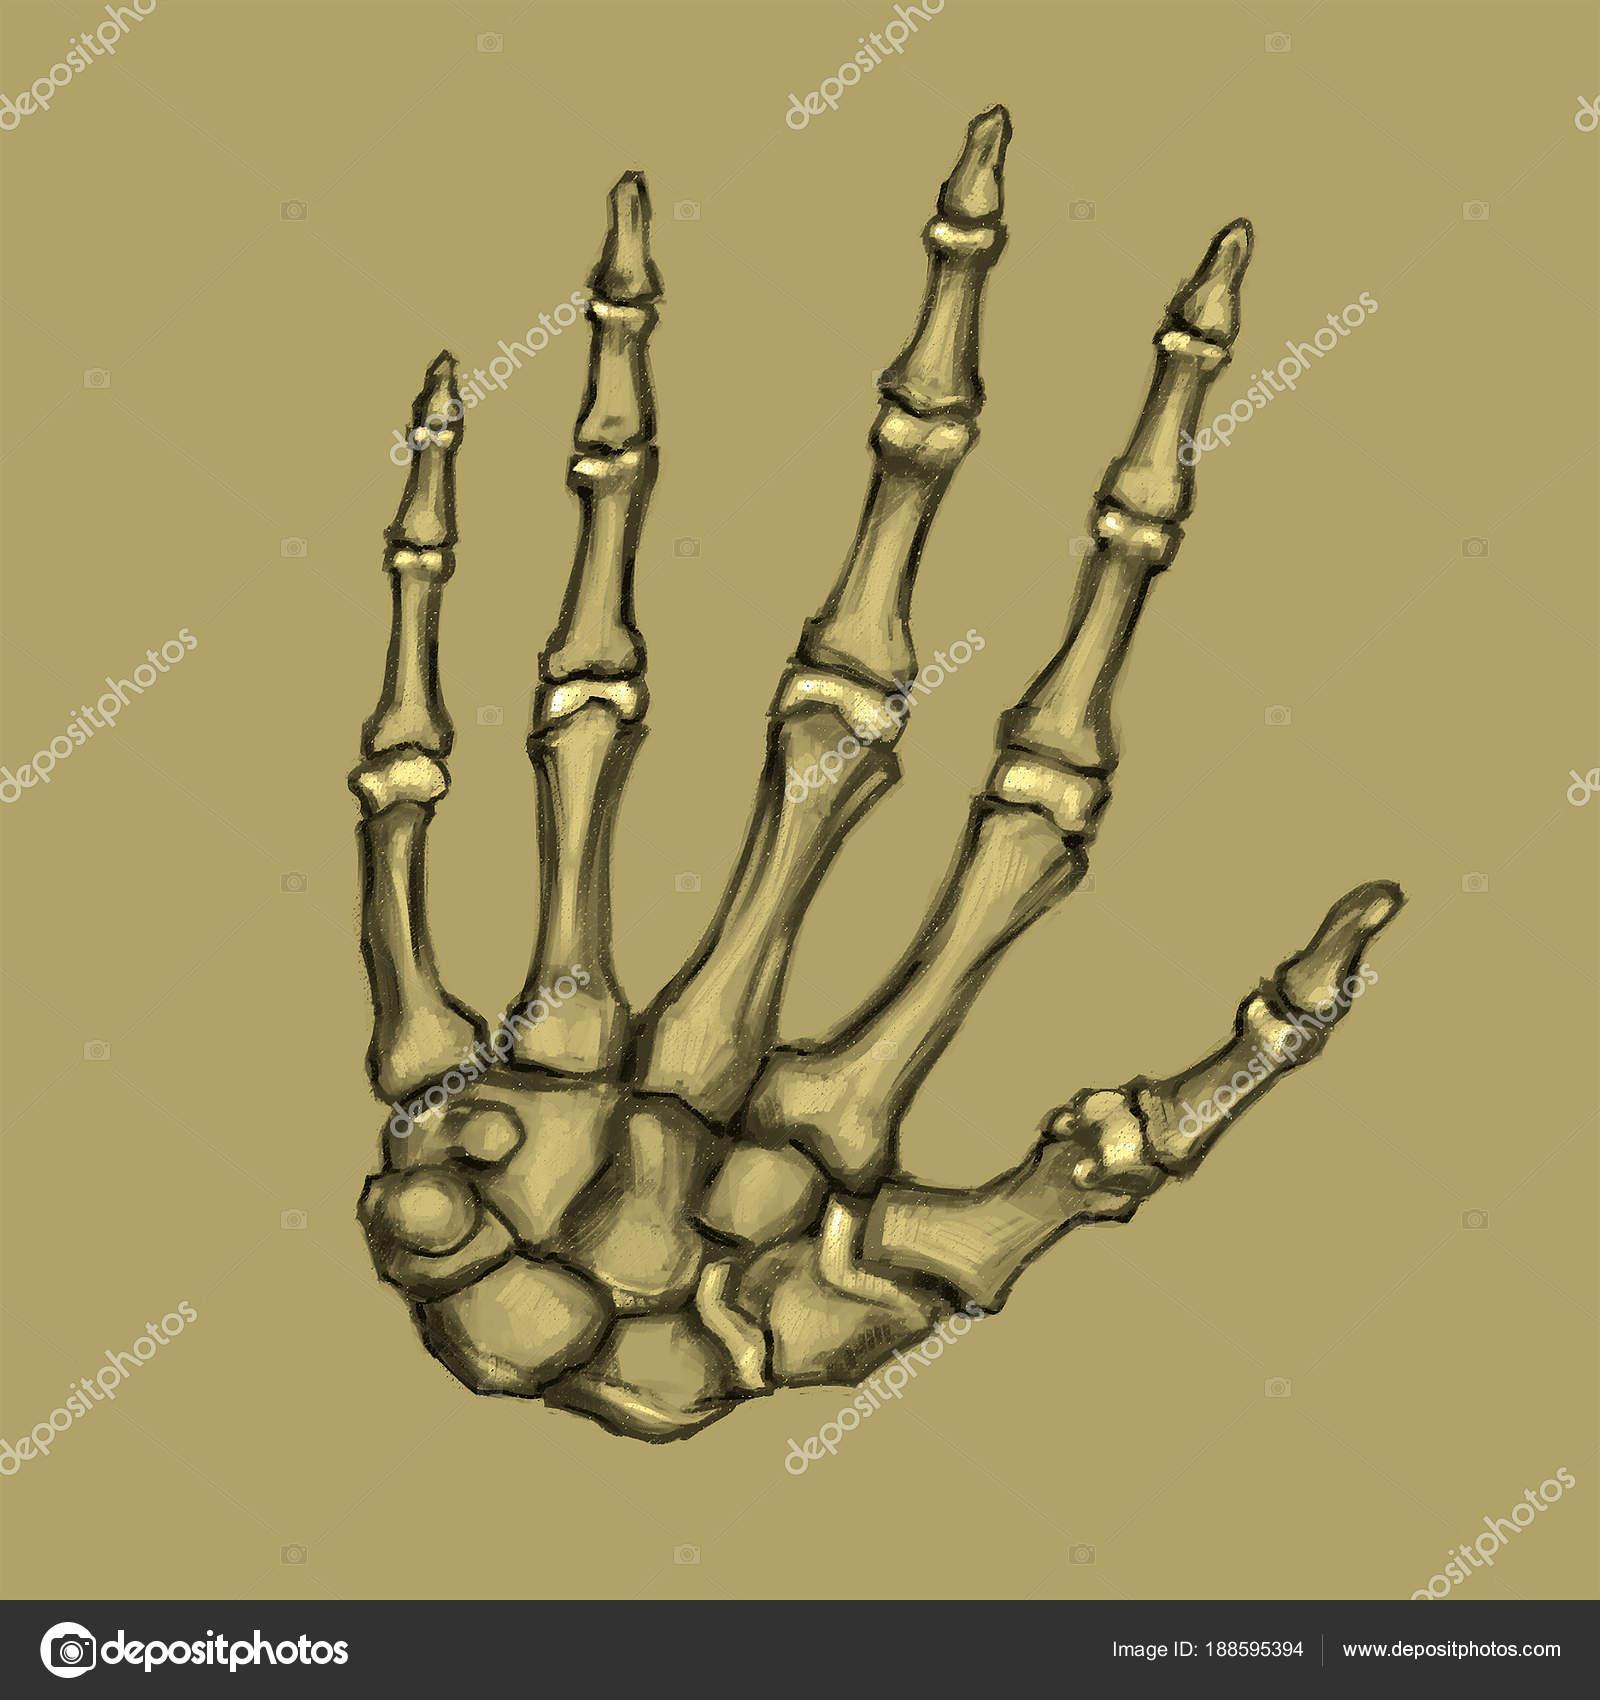 Huesos Mano Dibujado Mano Dibujo Anatómico Mano Esqueleto Humano ...